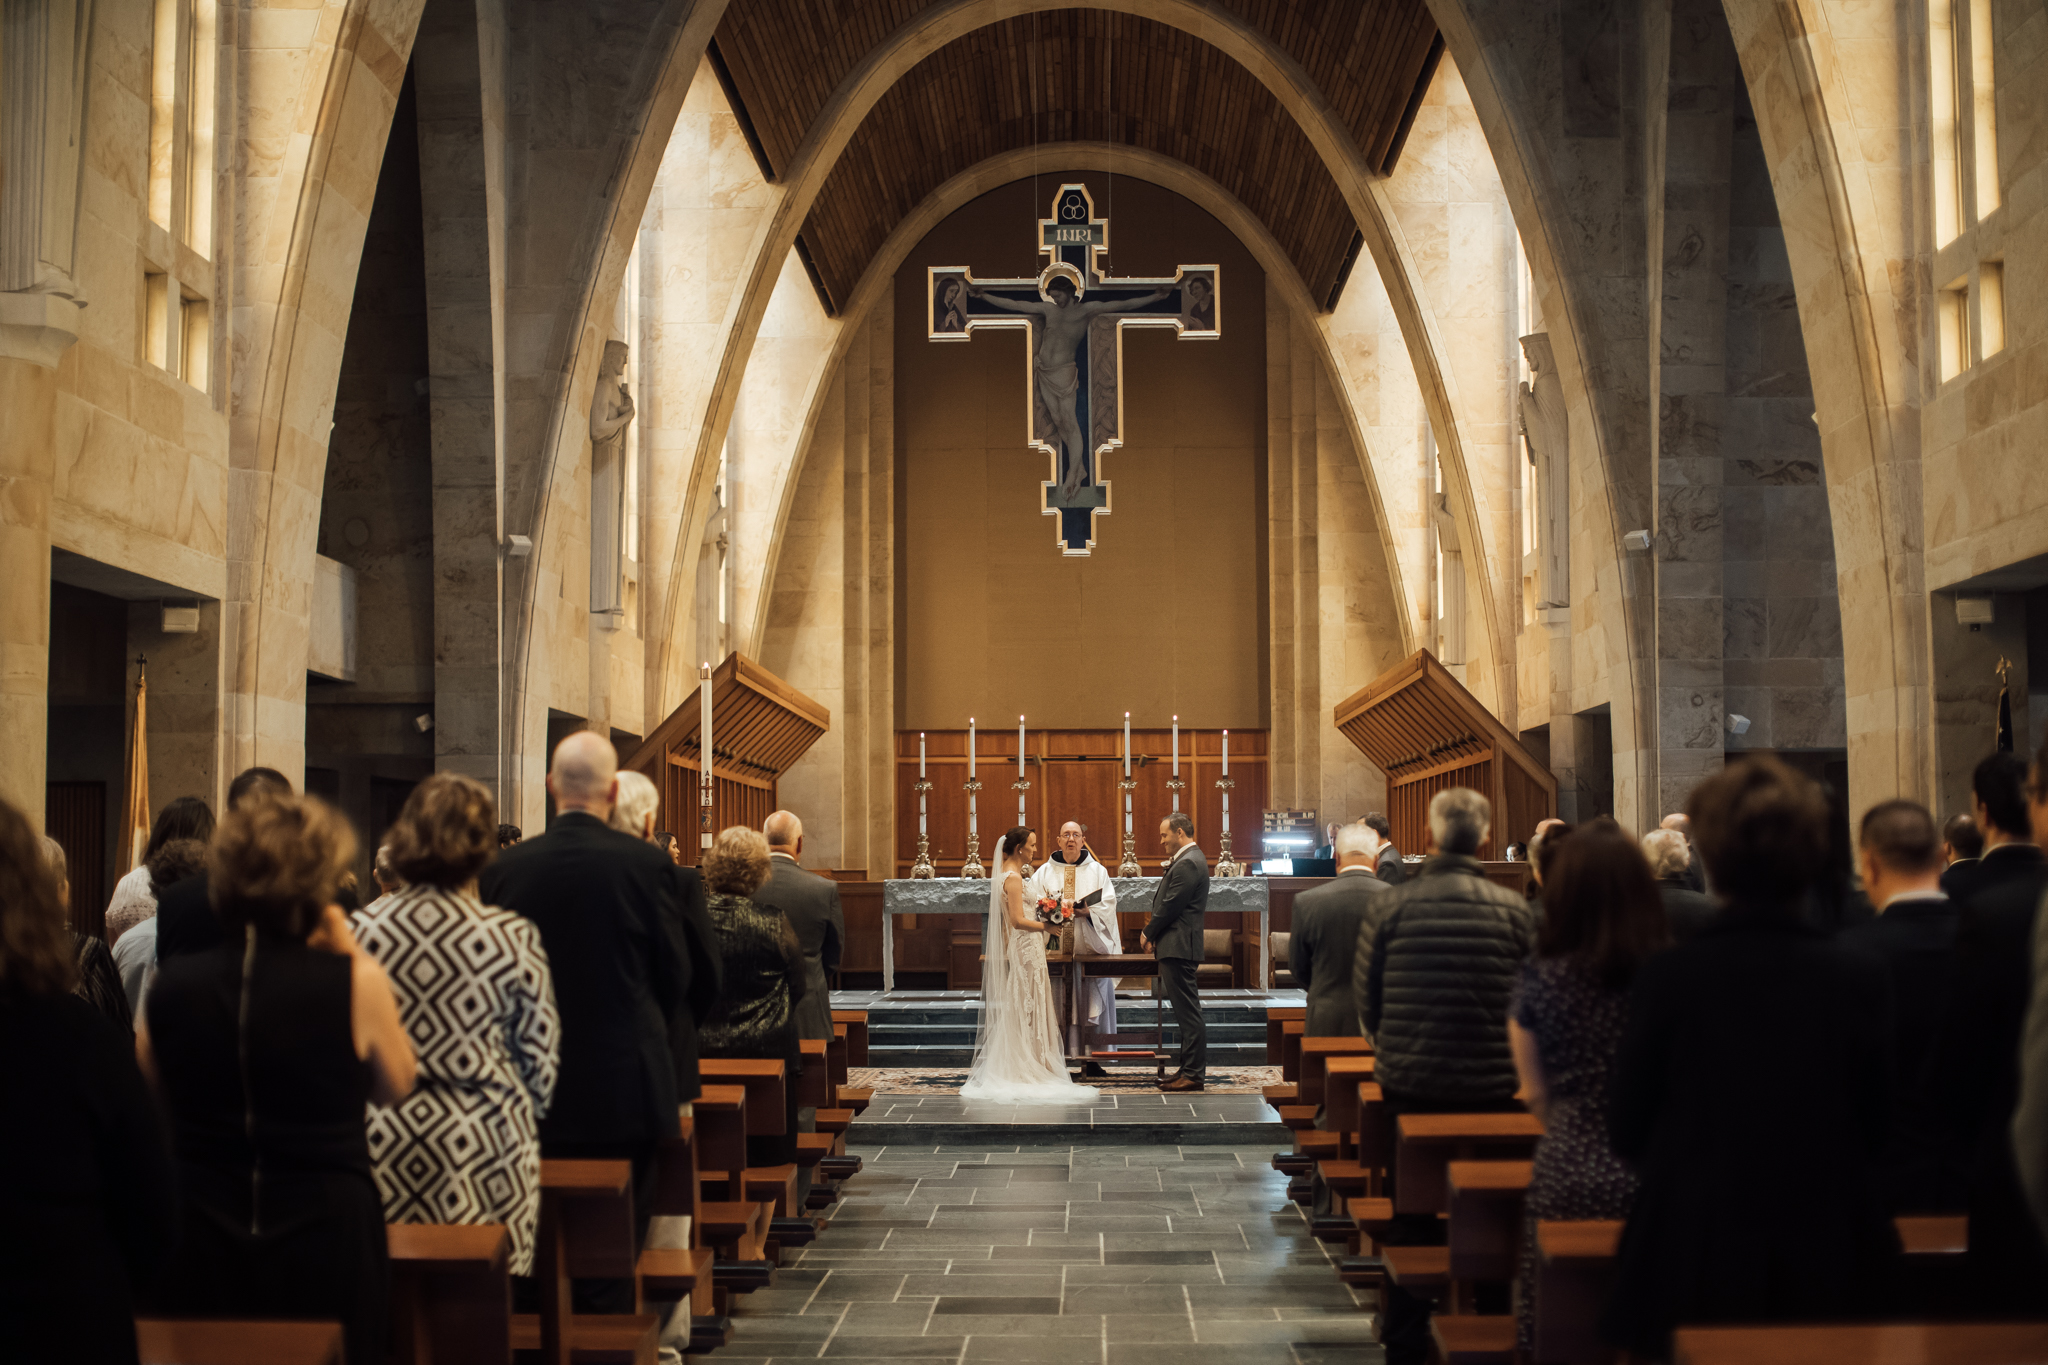 birmingham-alabama-wedding-photographer-laura-terry-the-warmth-around-you (76 of 110).jpg